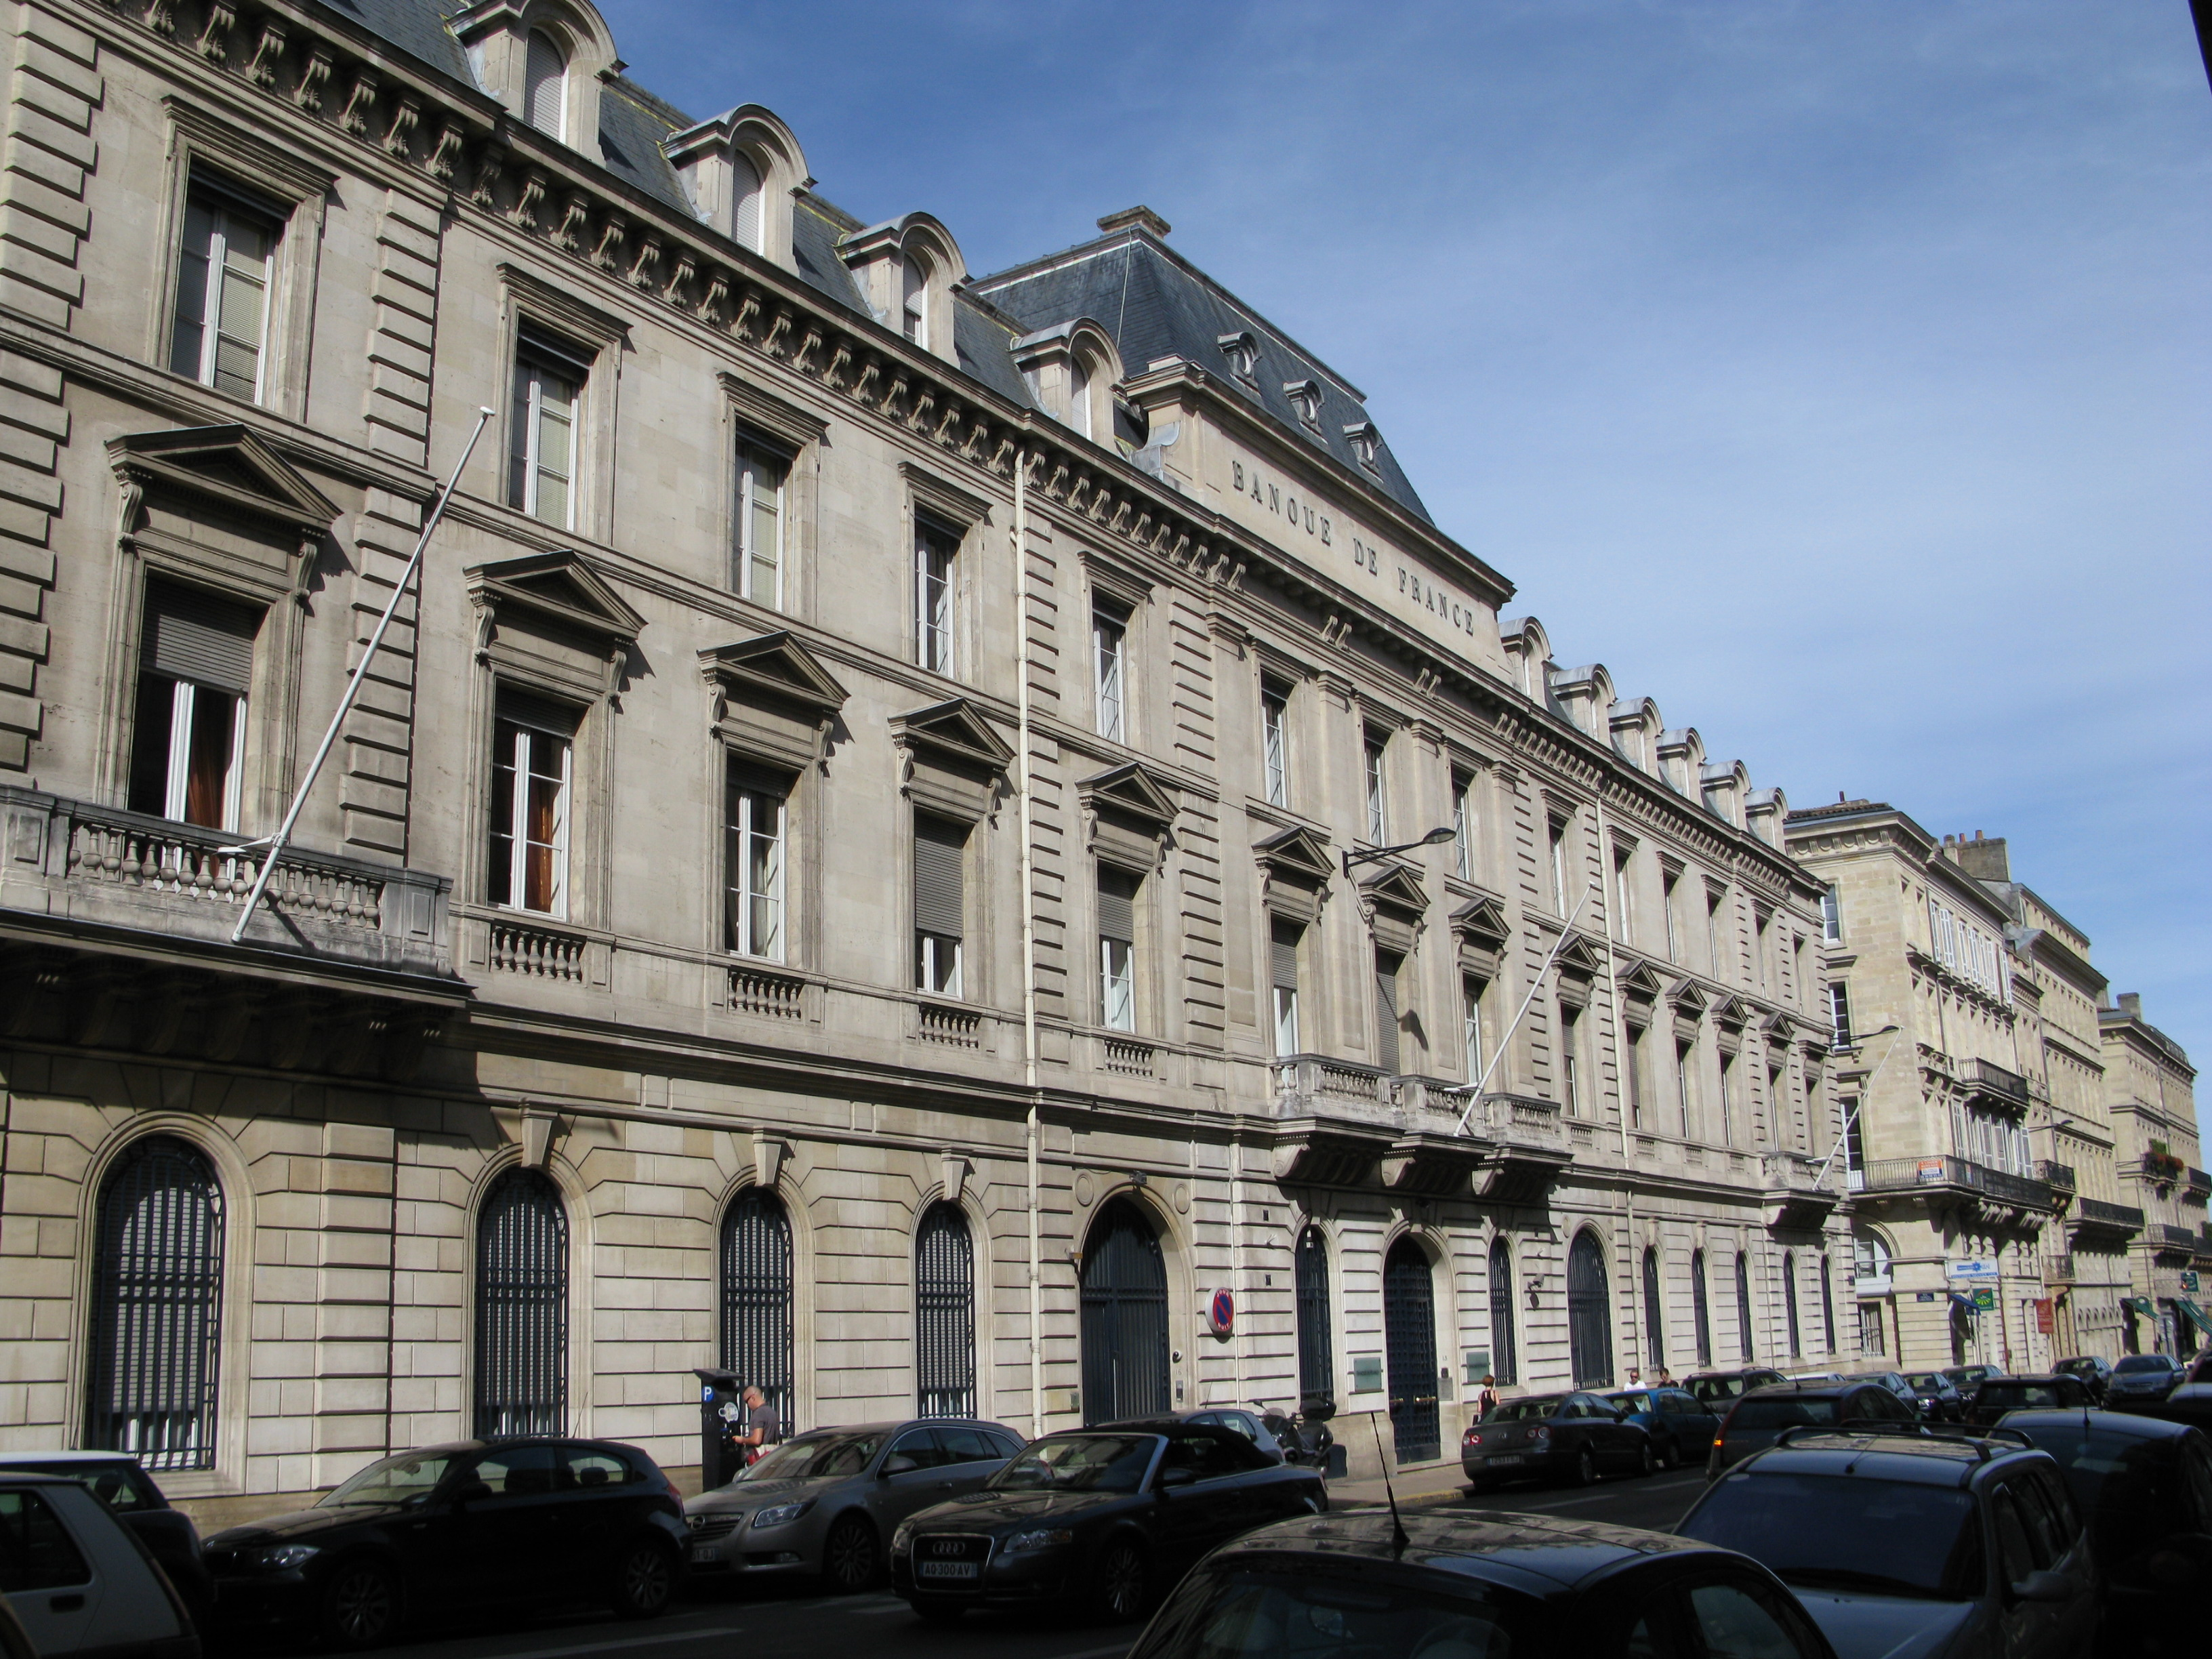 Forex agree banque de france